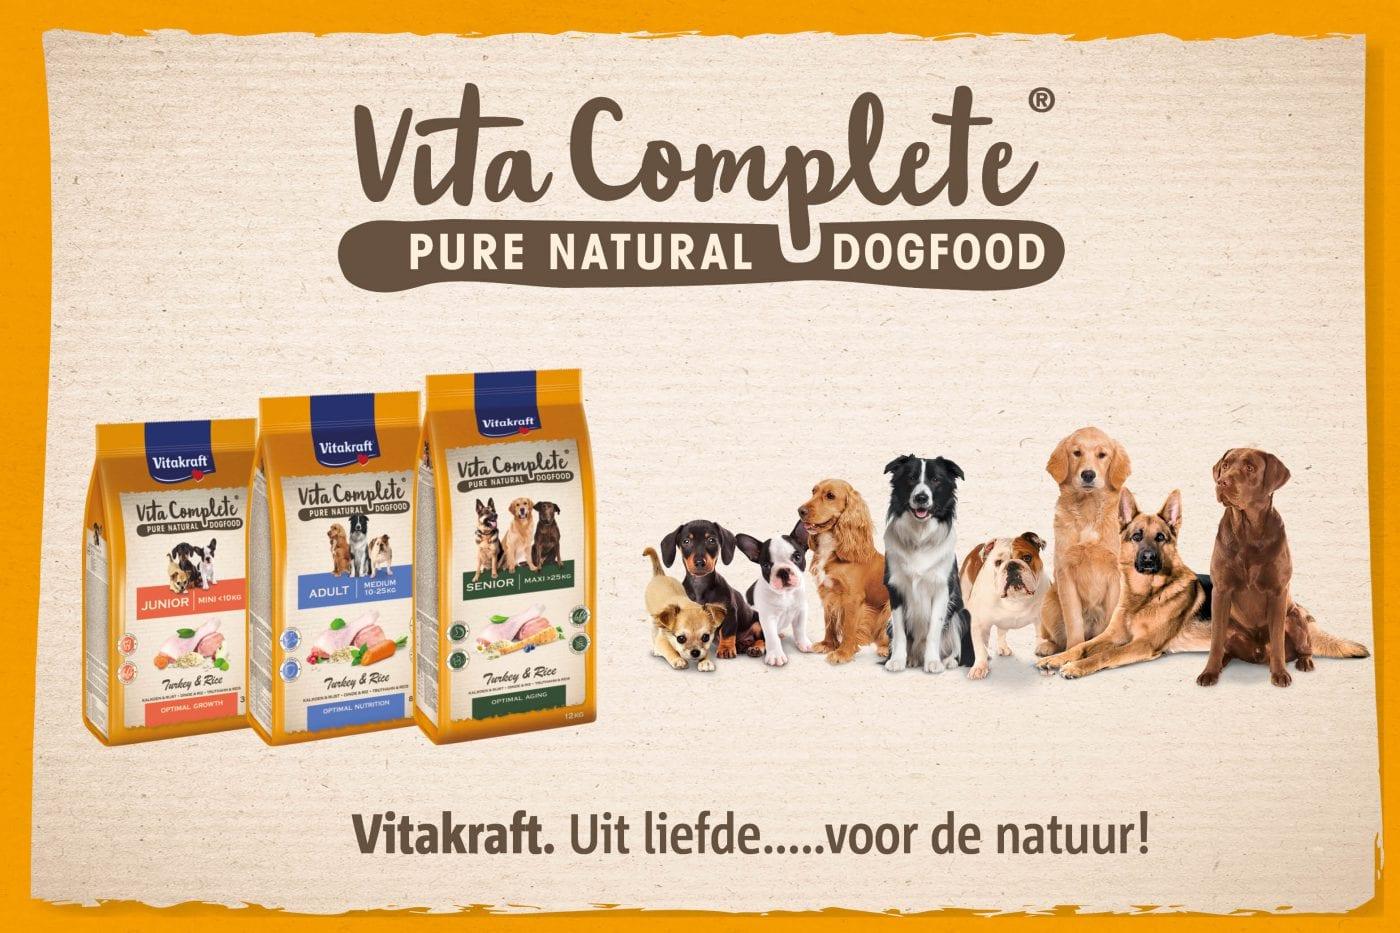 Vita Complete® Pure Natural Dogfood